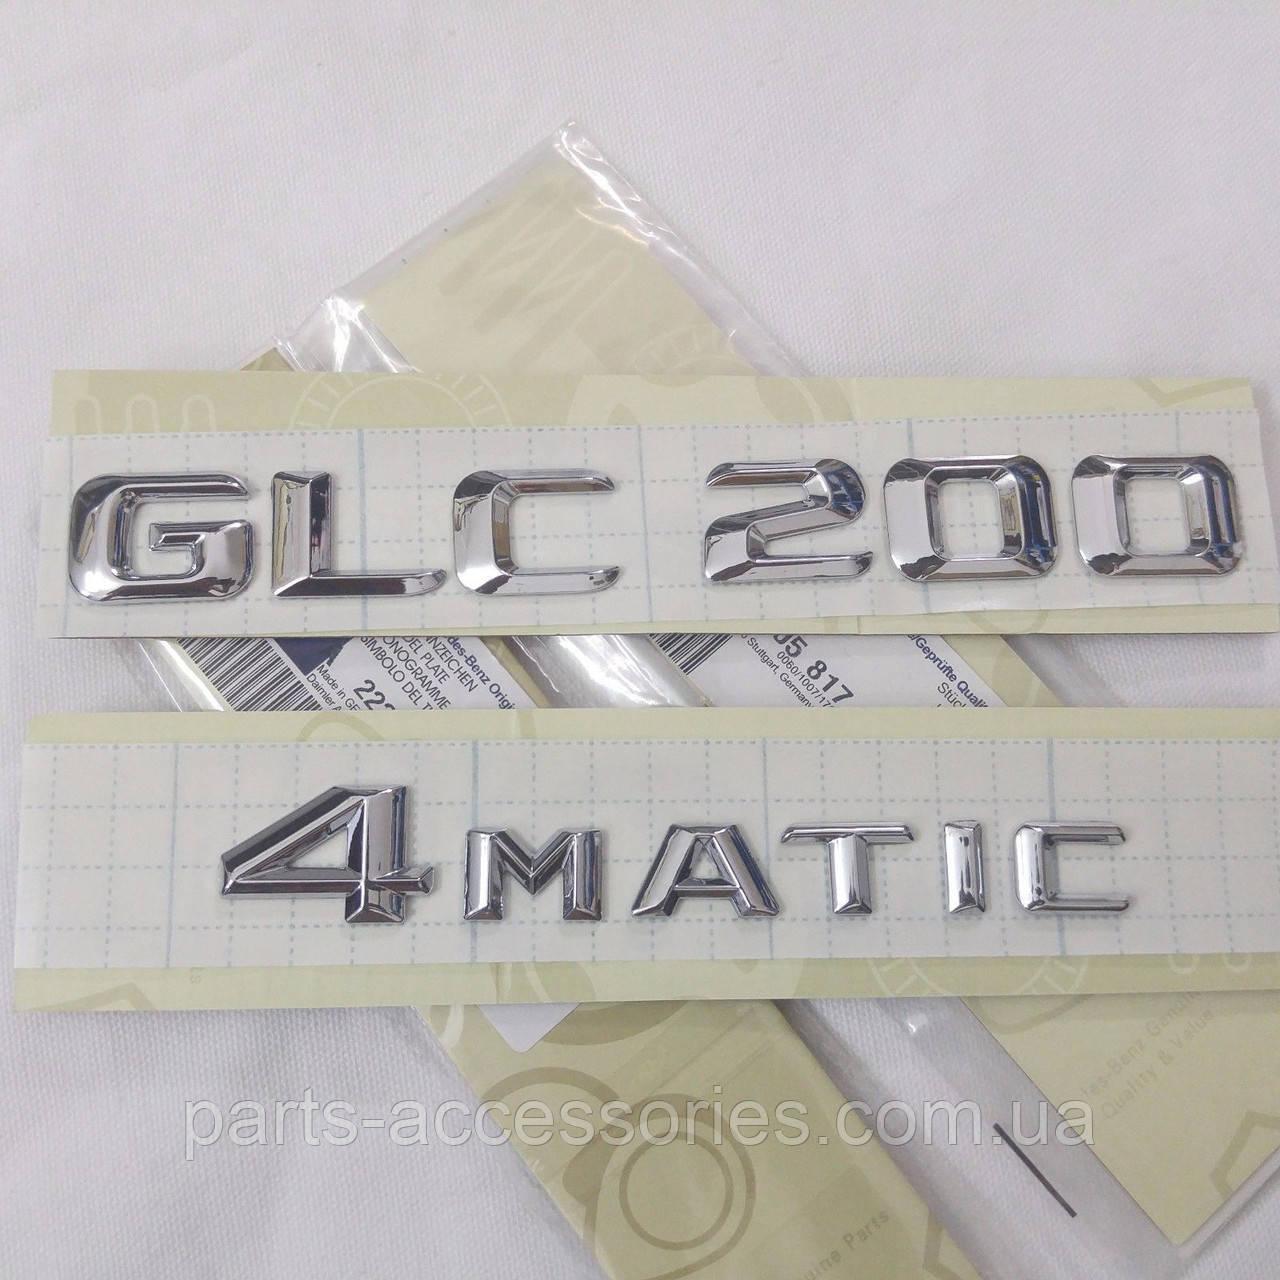 Mercedes GLC GLC-Class X253 2015+ эмблема значок на багажник GLC200 4Matic новые оригинал